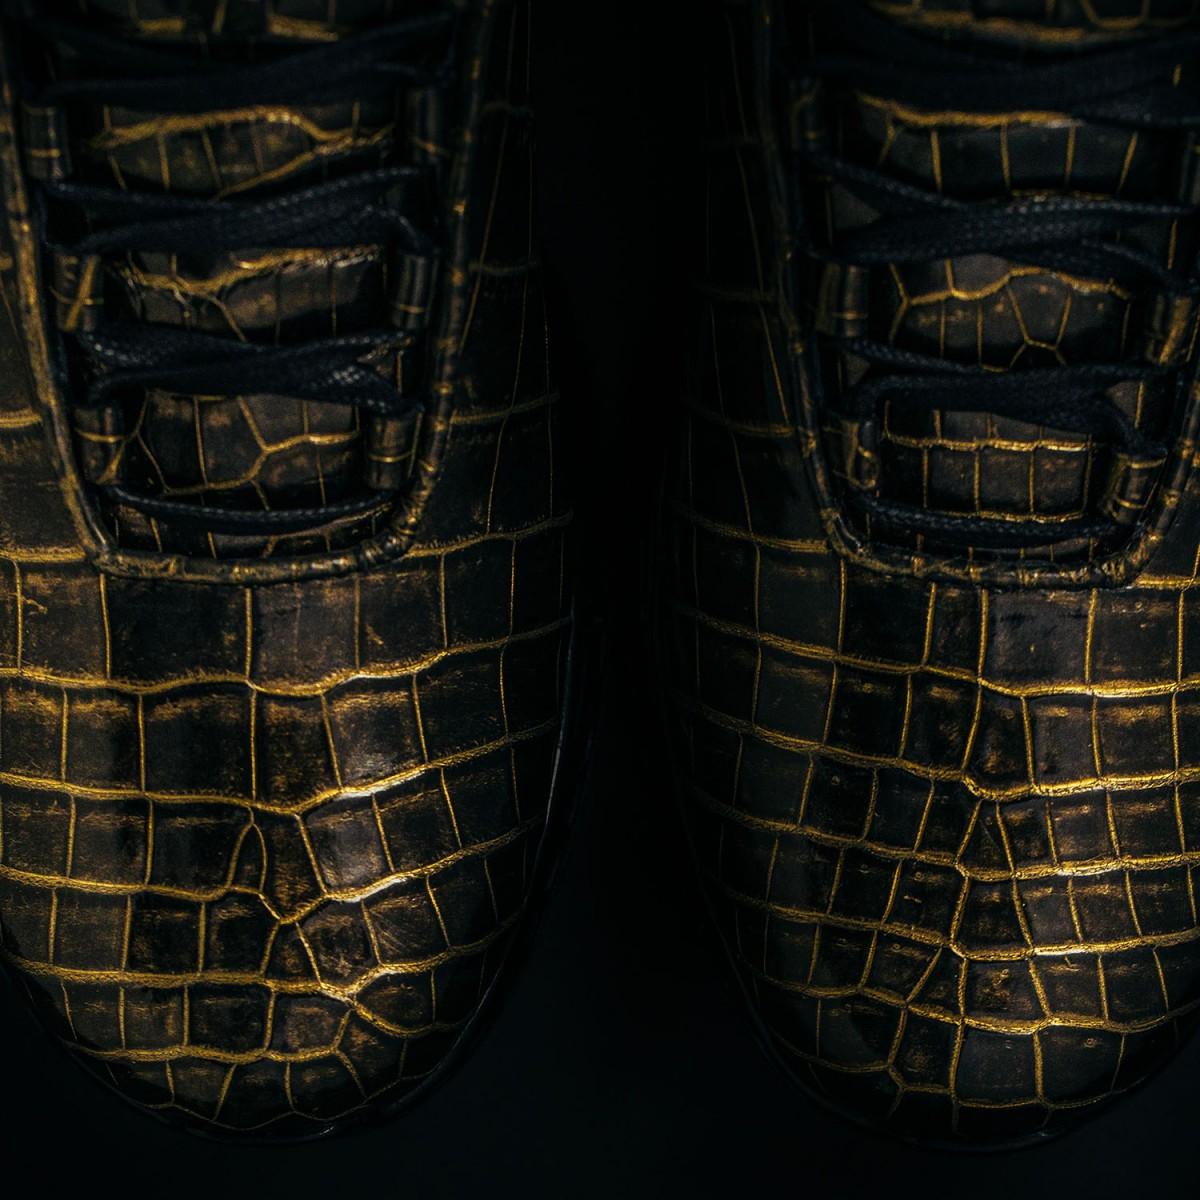 lusso-black-gold-9